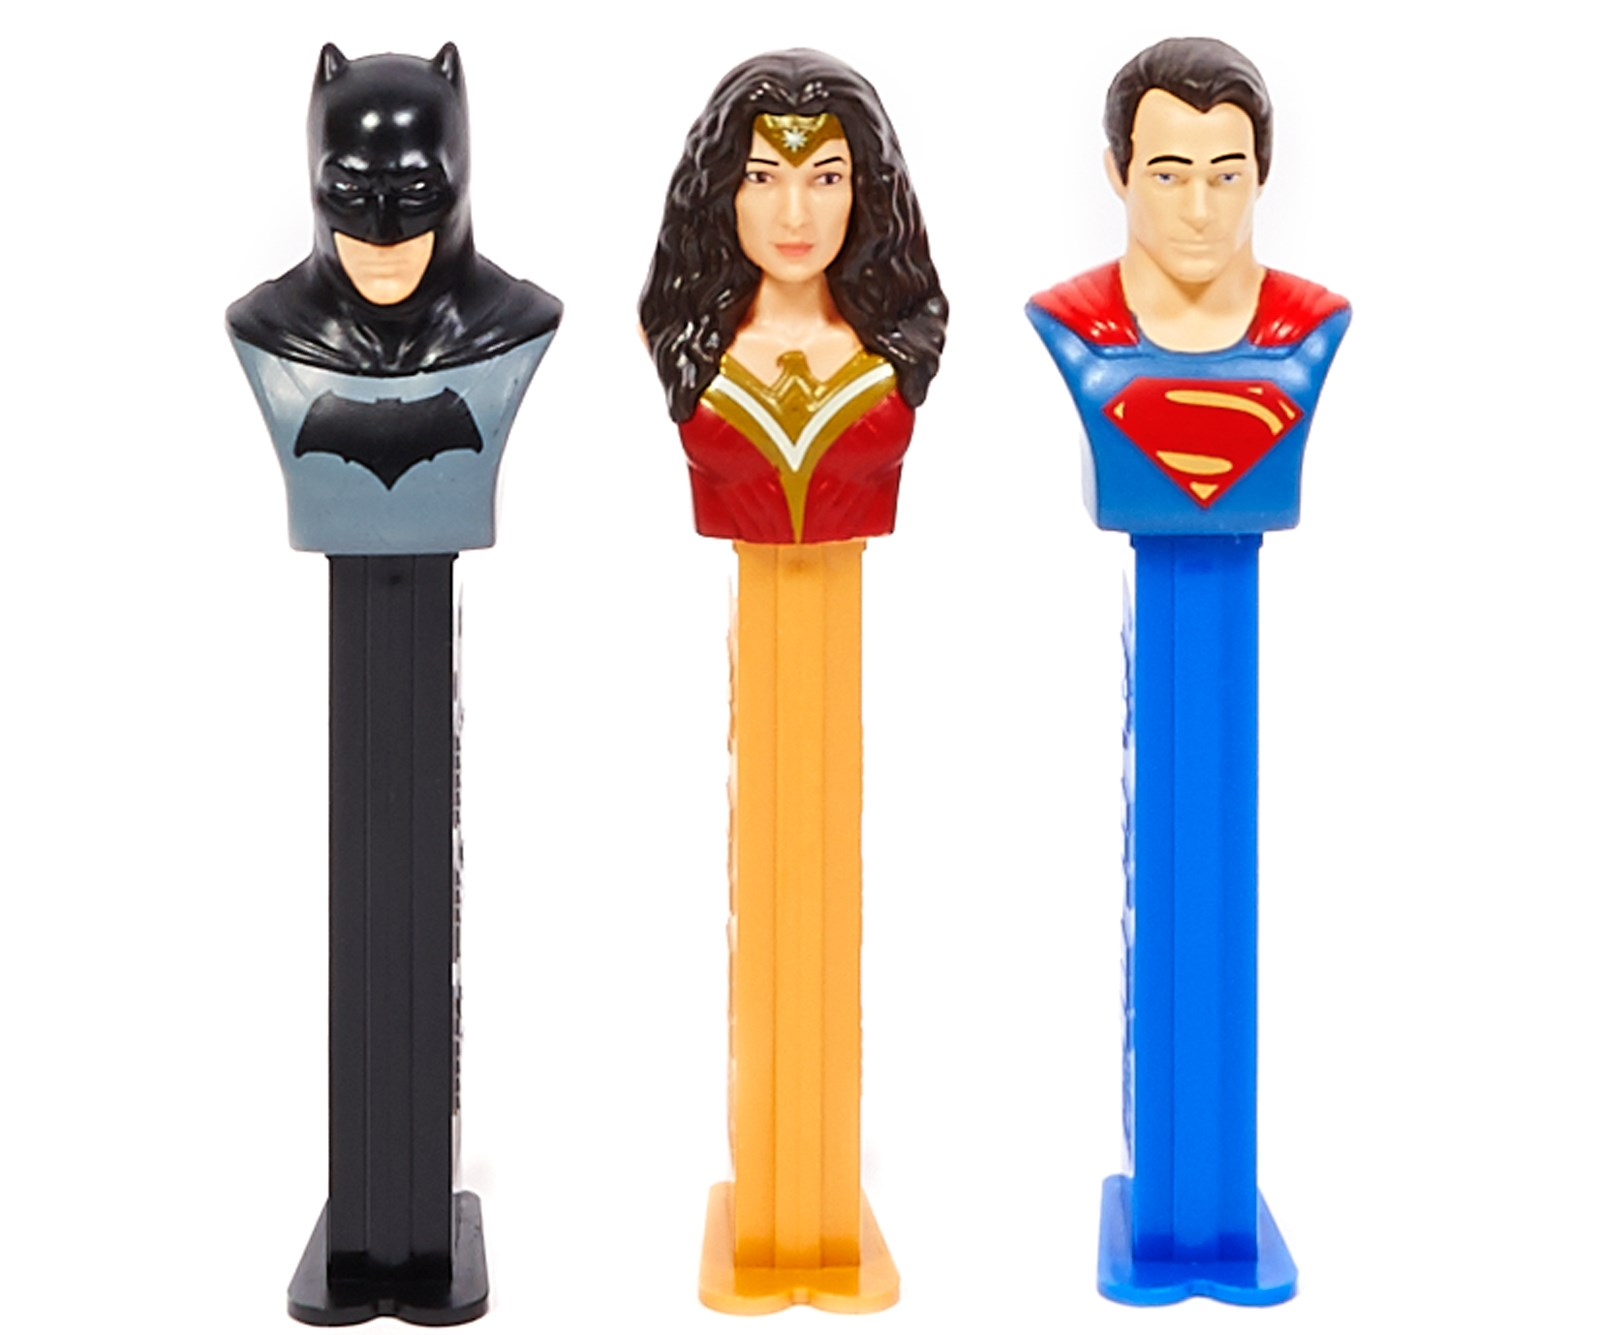 Image of DC Comics Superhero Pez Dispenser